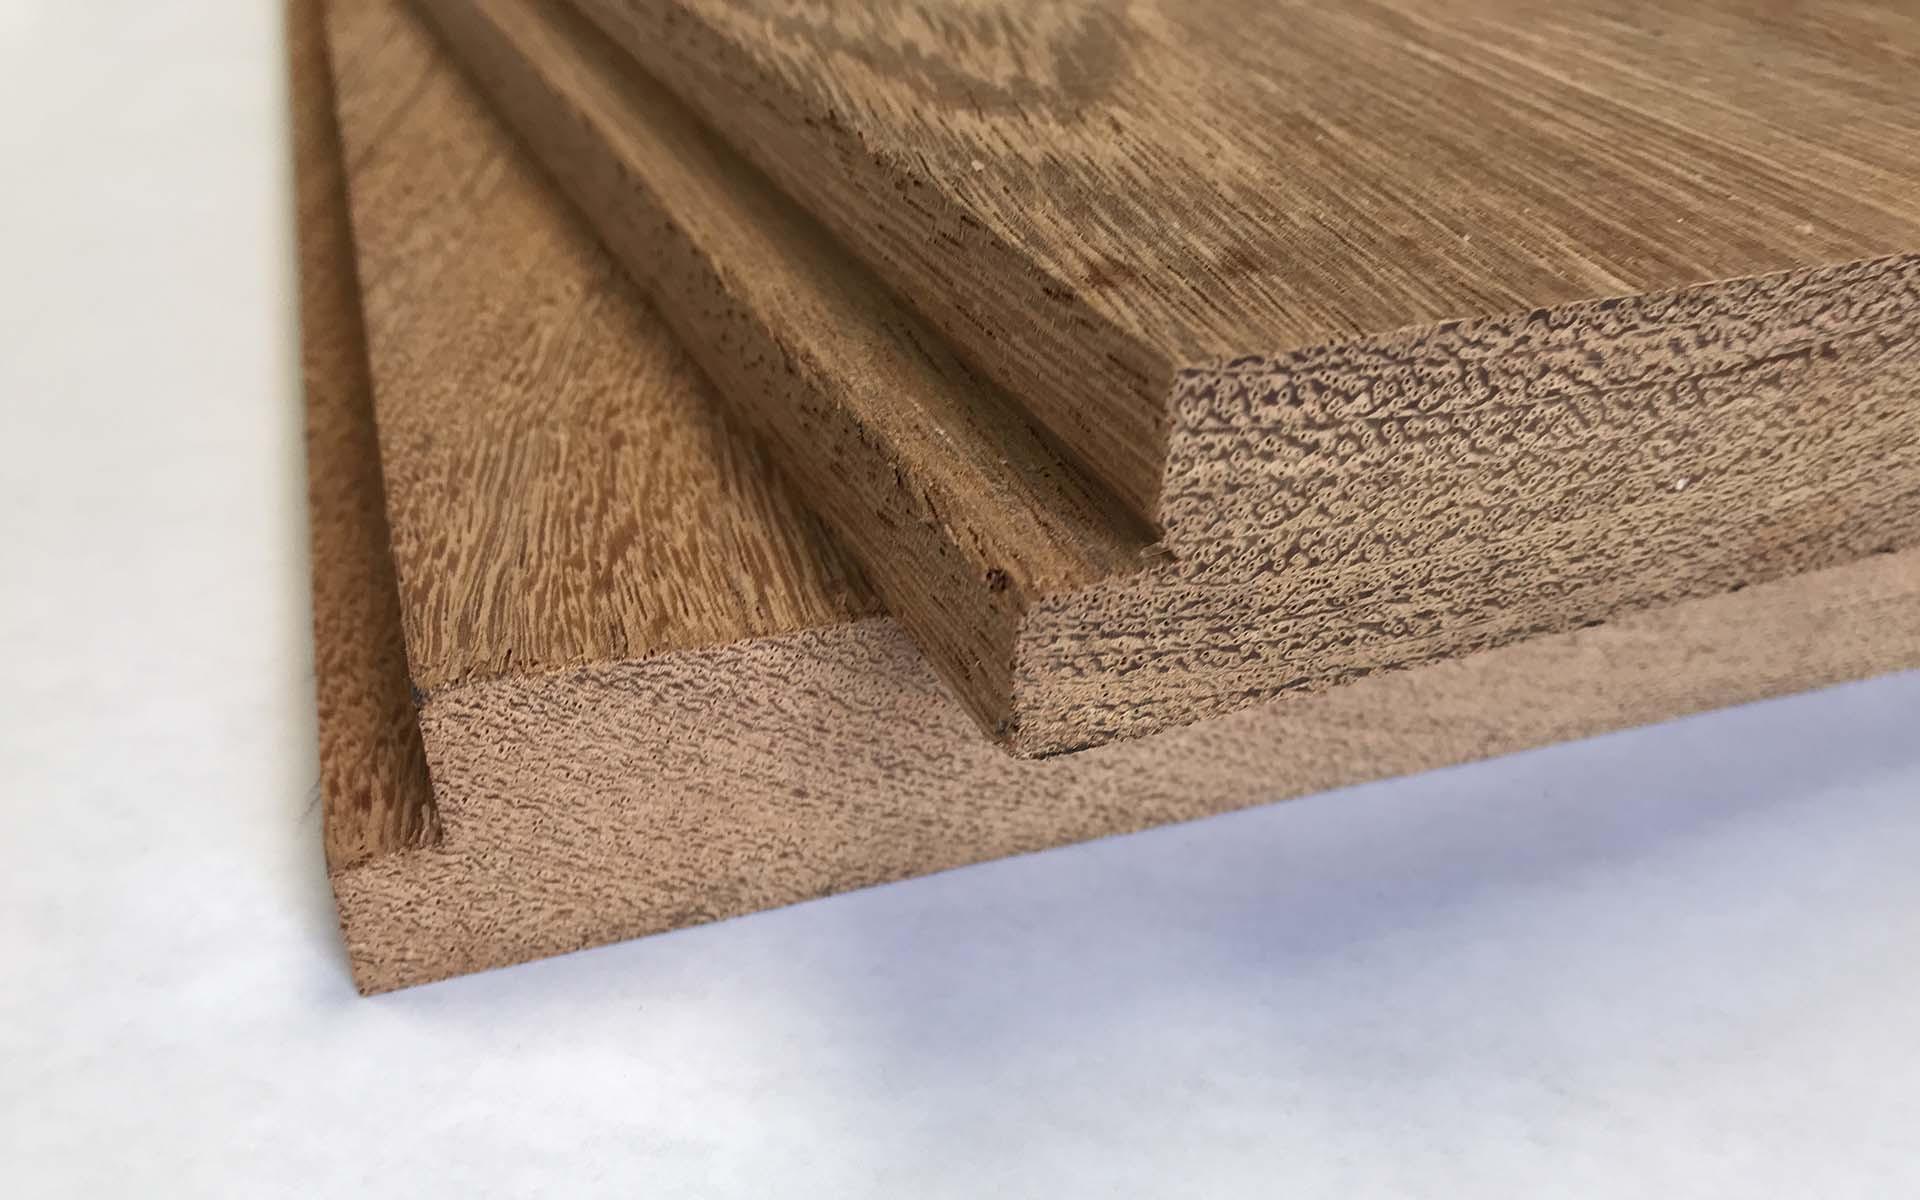 wholesale hardwood flooring st louis of buy trailer decking apitong shiplap rough boards truck flooring throughout 3 angelim pedra shiplap close up